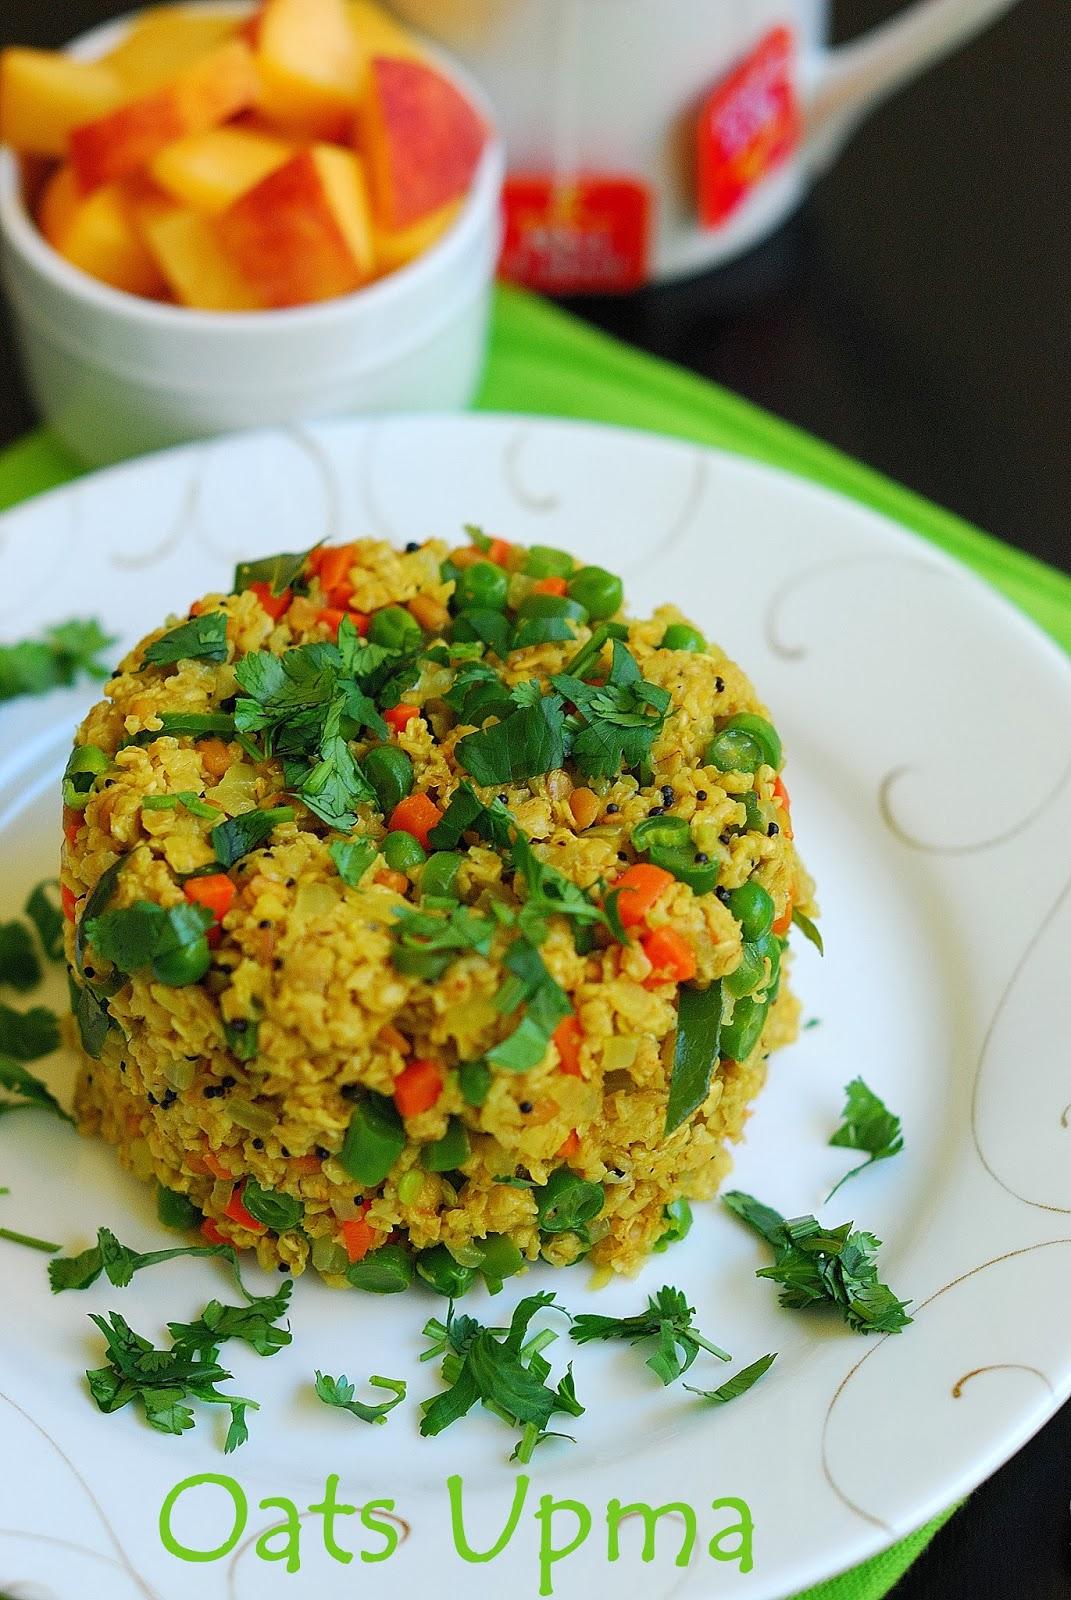 Oats upma indian breakfast recipe healthy breakfast recipe from my home kitchen forumfinder Images